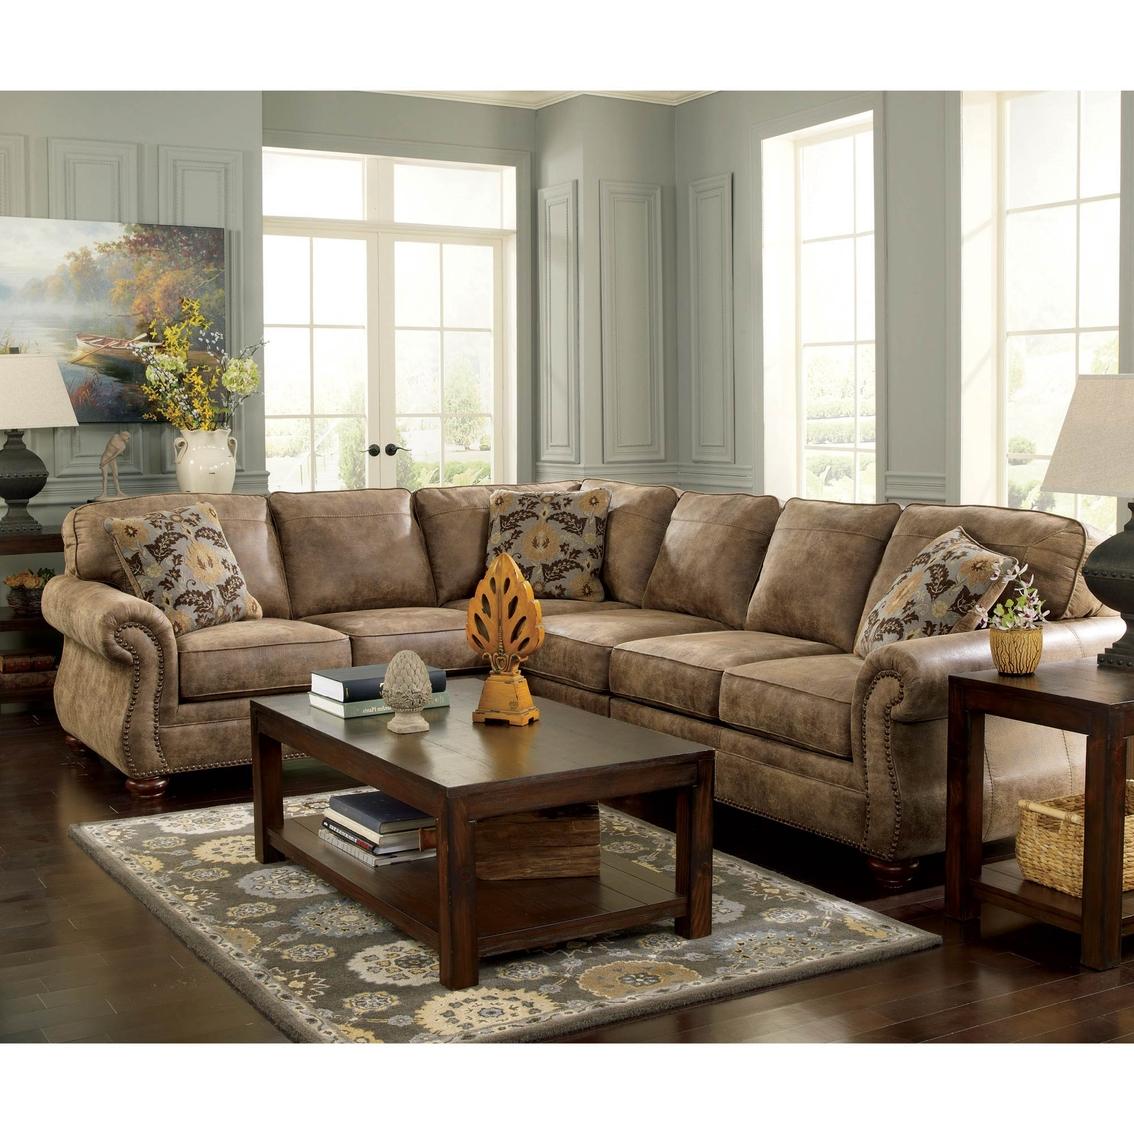 American Furniture Warehouse Return Policy American Furniture Warehouse Return Policy Home